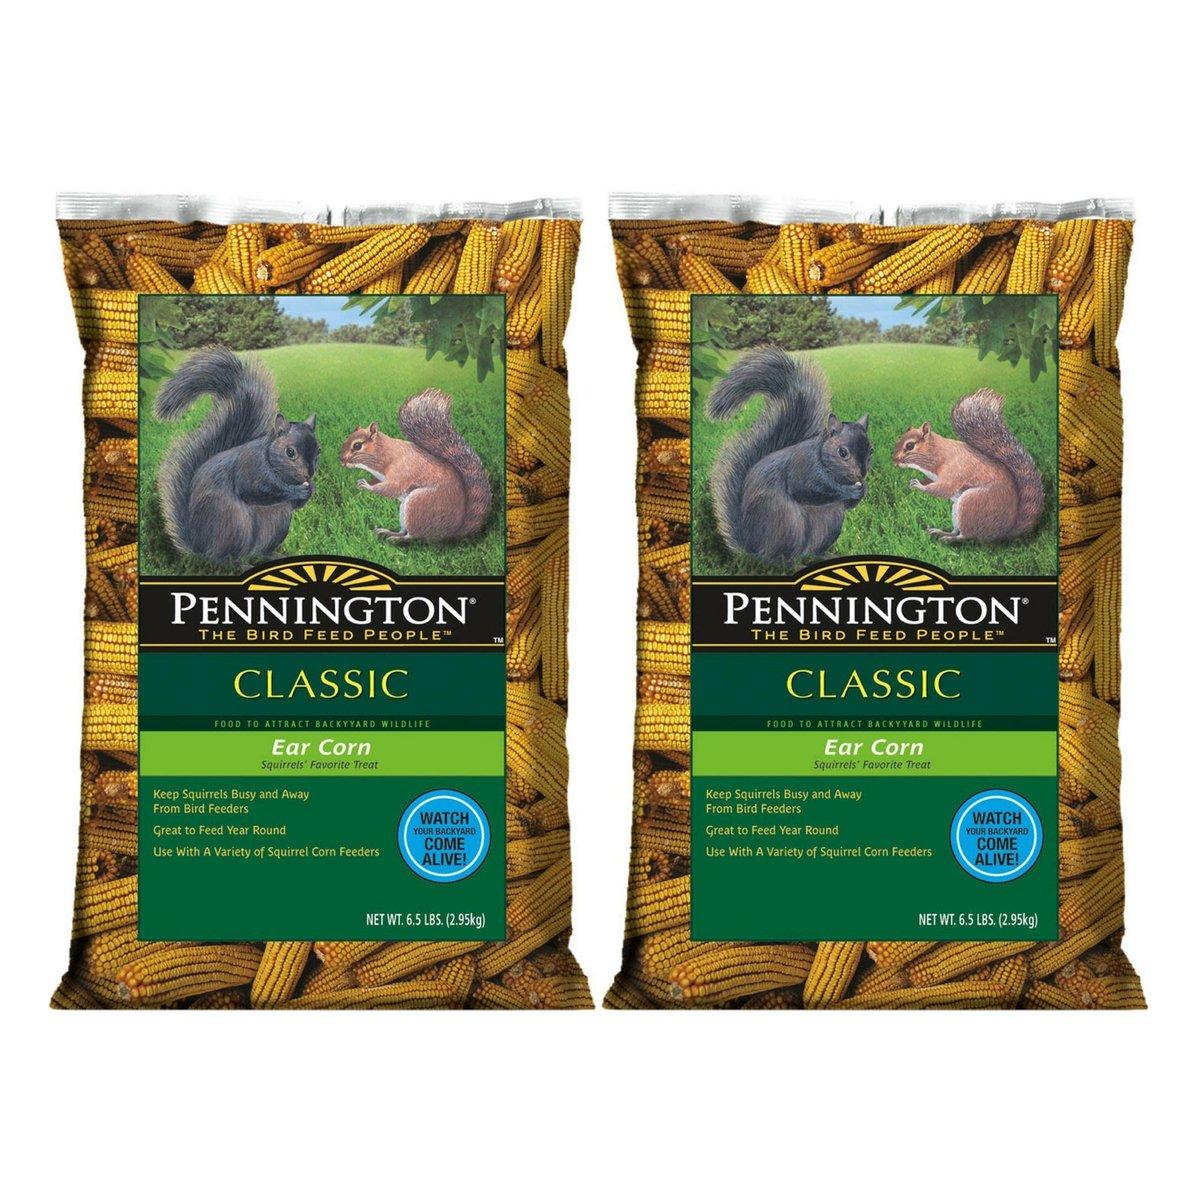 Pennington Ear Corn on Cob Squirrel Food (2, 6.5 lb)